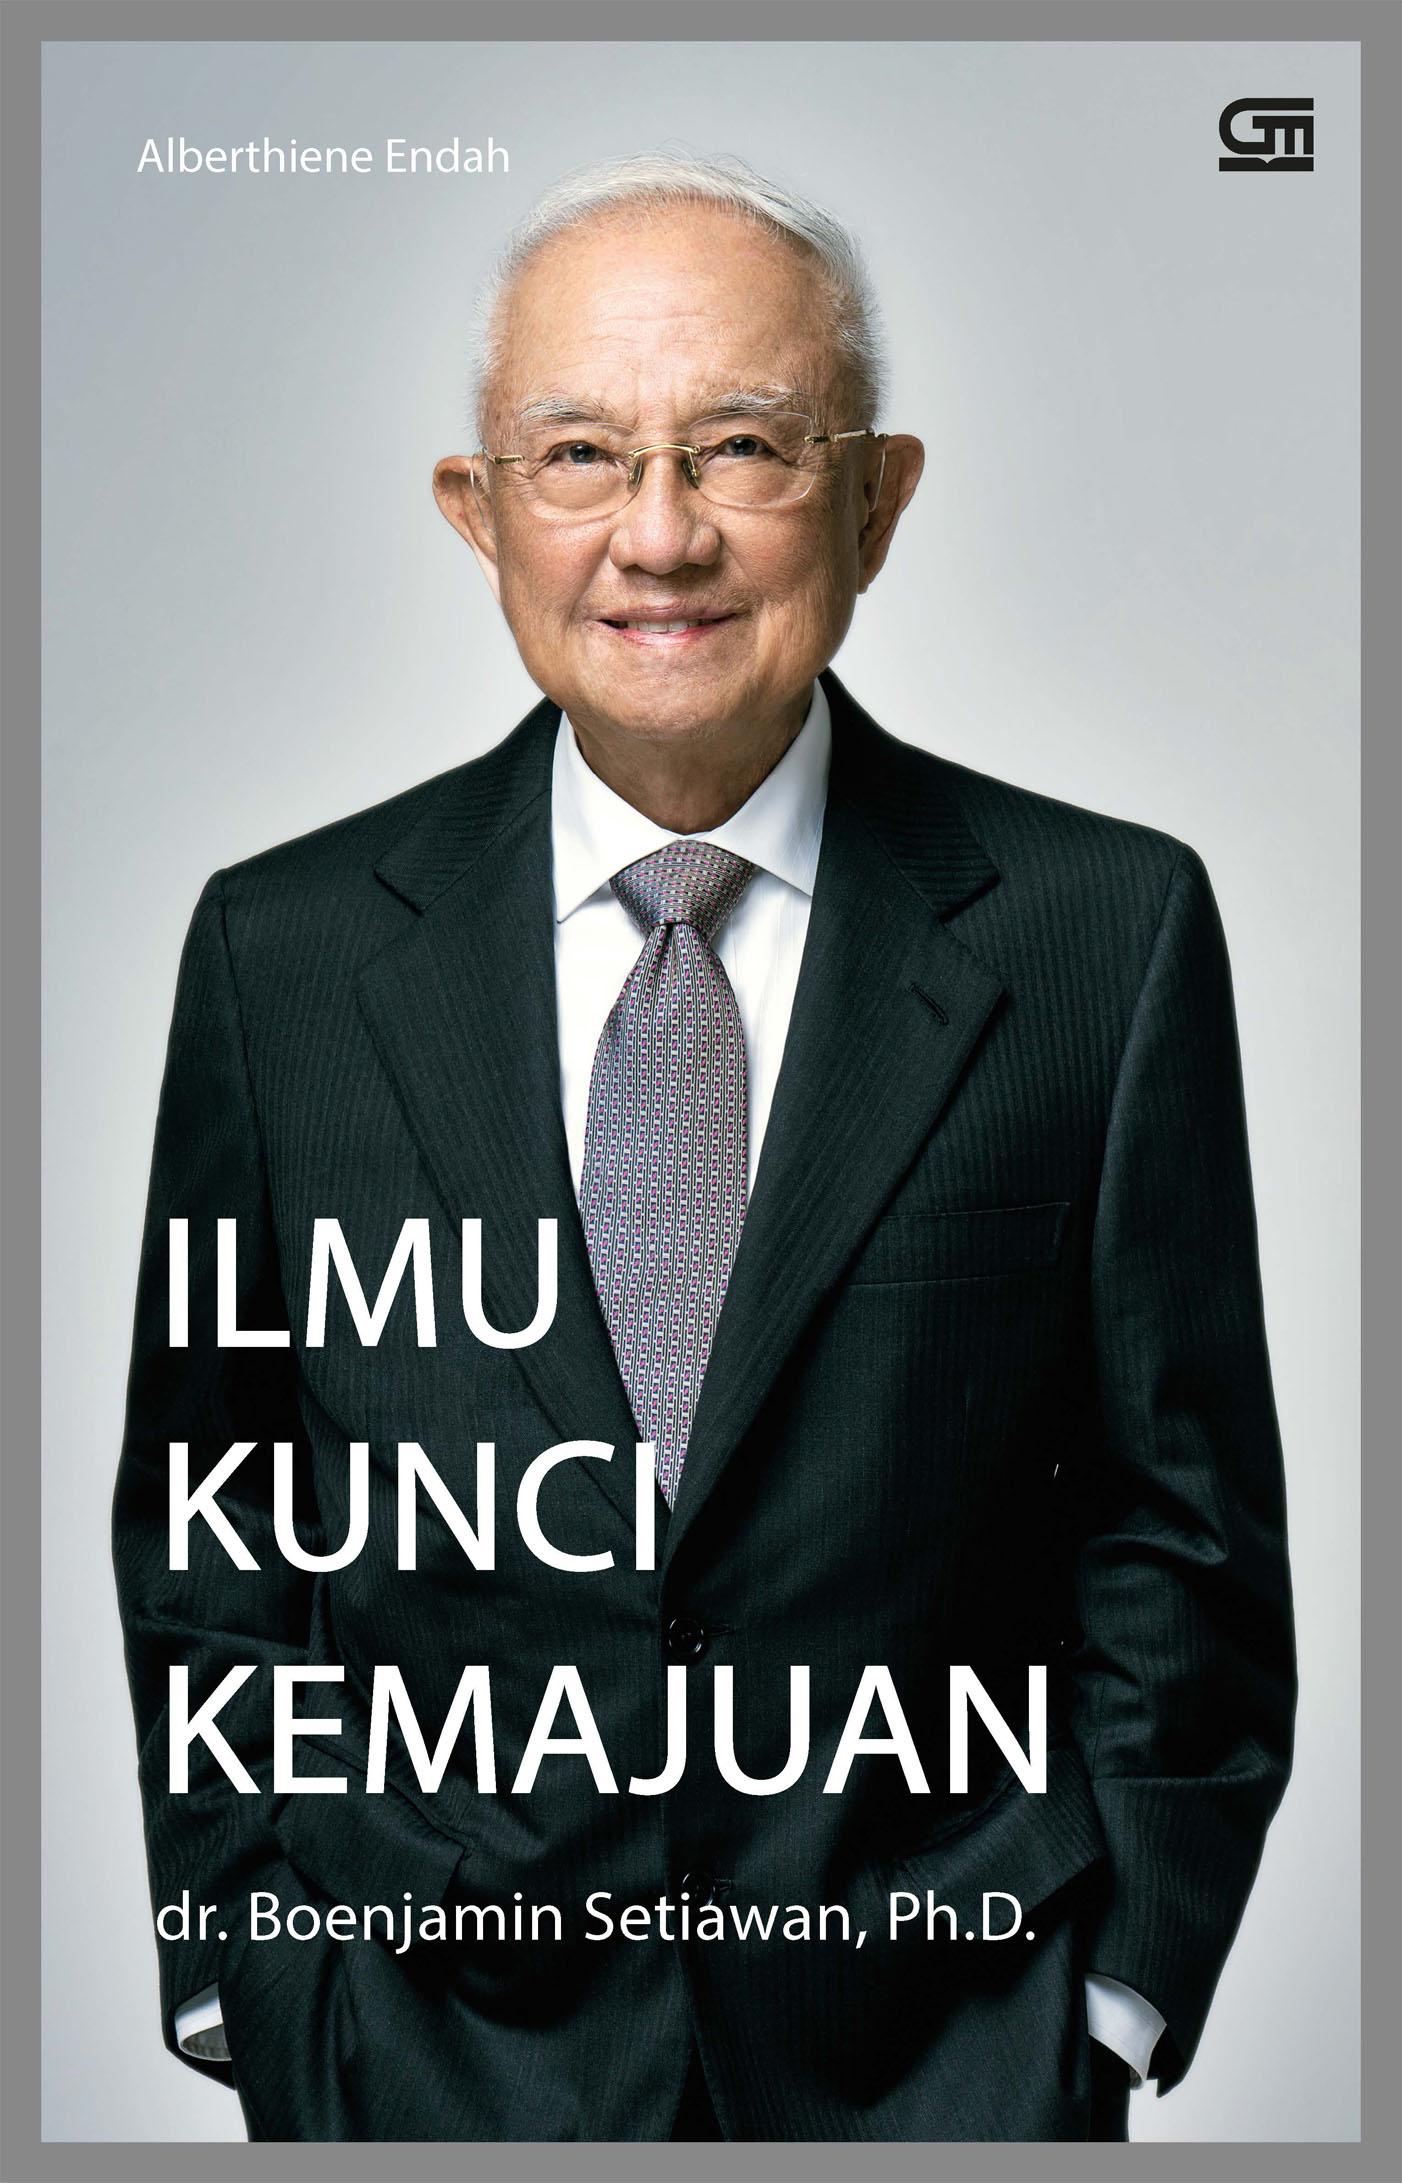 dr. Boenjamin Setiawan, Ph.D: Ilmu Kunci Kemajuan